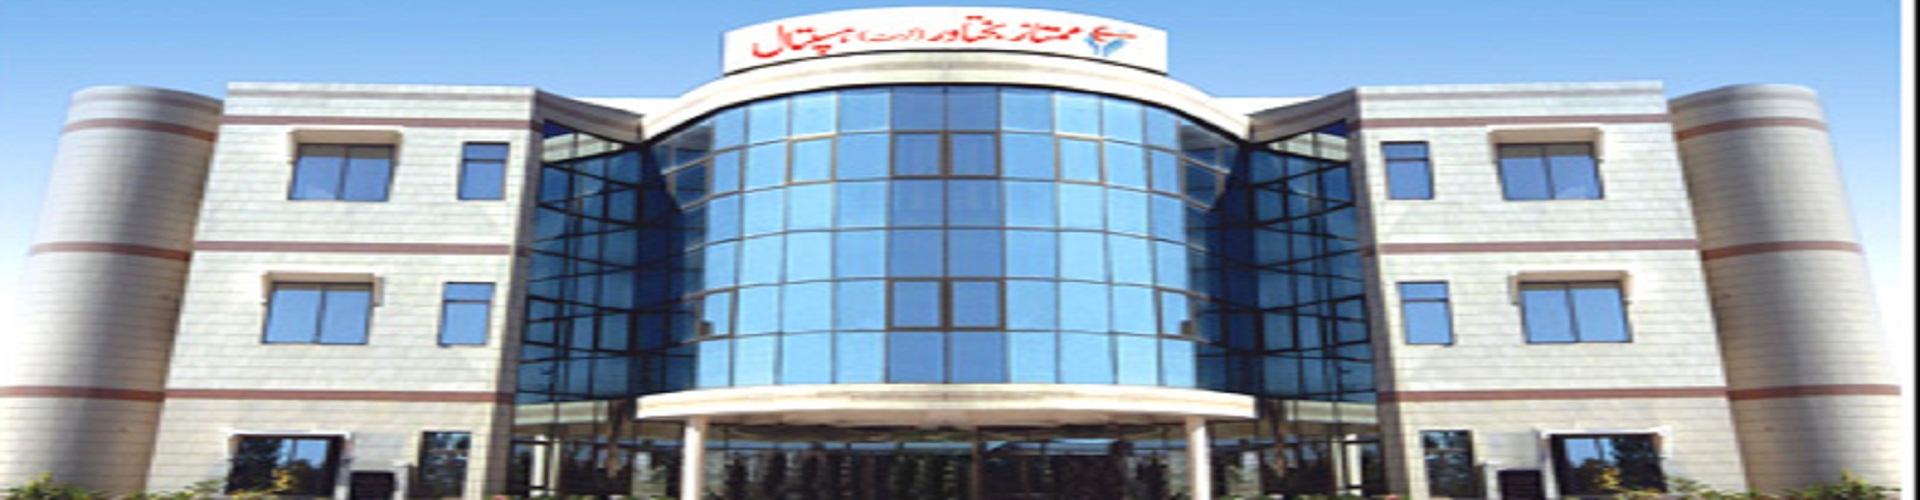 Mumtaz bakhtawar hospital front